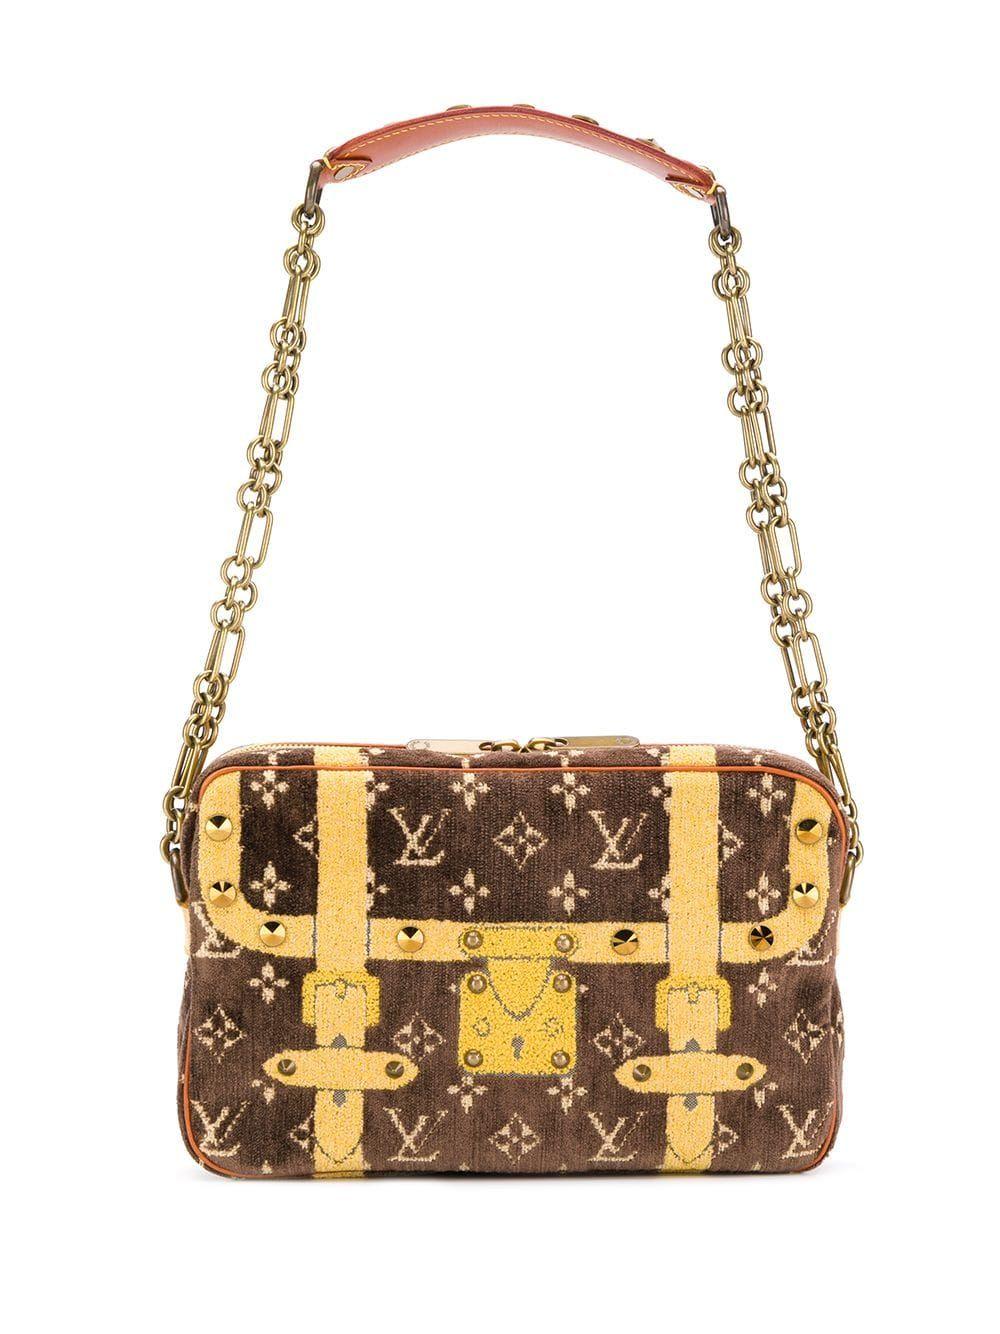 Discover Louis Vuitton Pochette Metis Via Louis Vuitton Louis Vuitton Pochette Metis Louis Vuitton Pochette Louis Vuitton Handbags Outlet